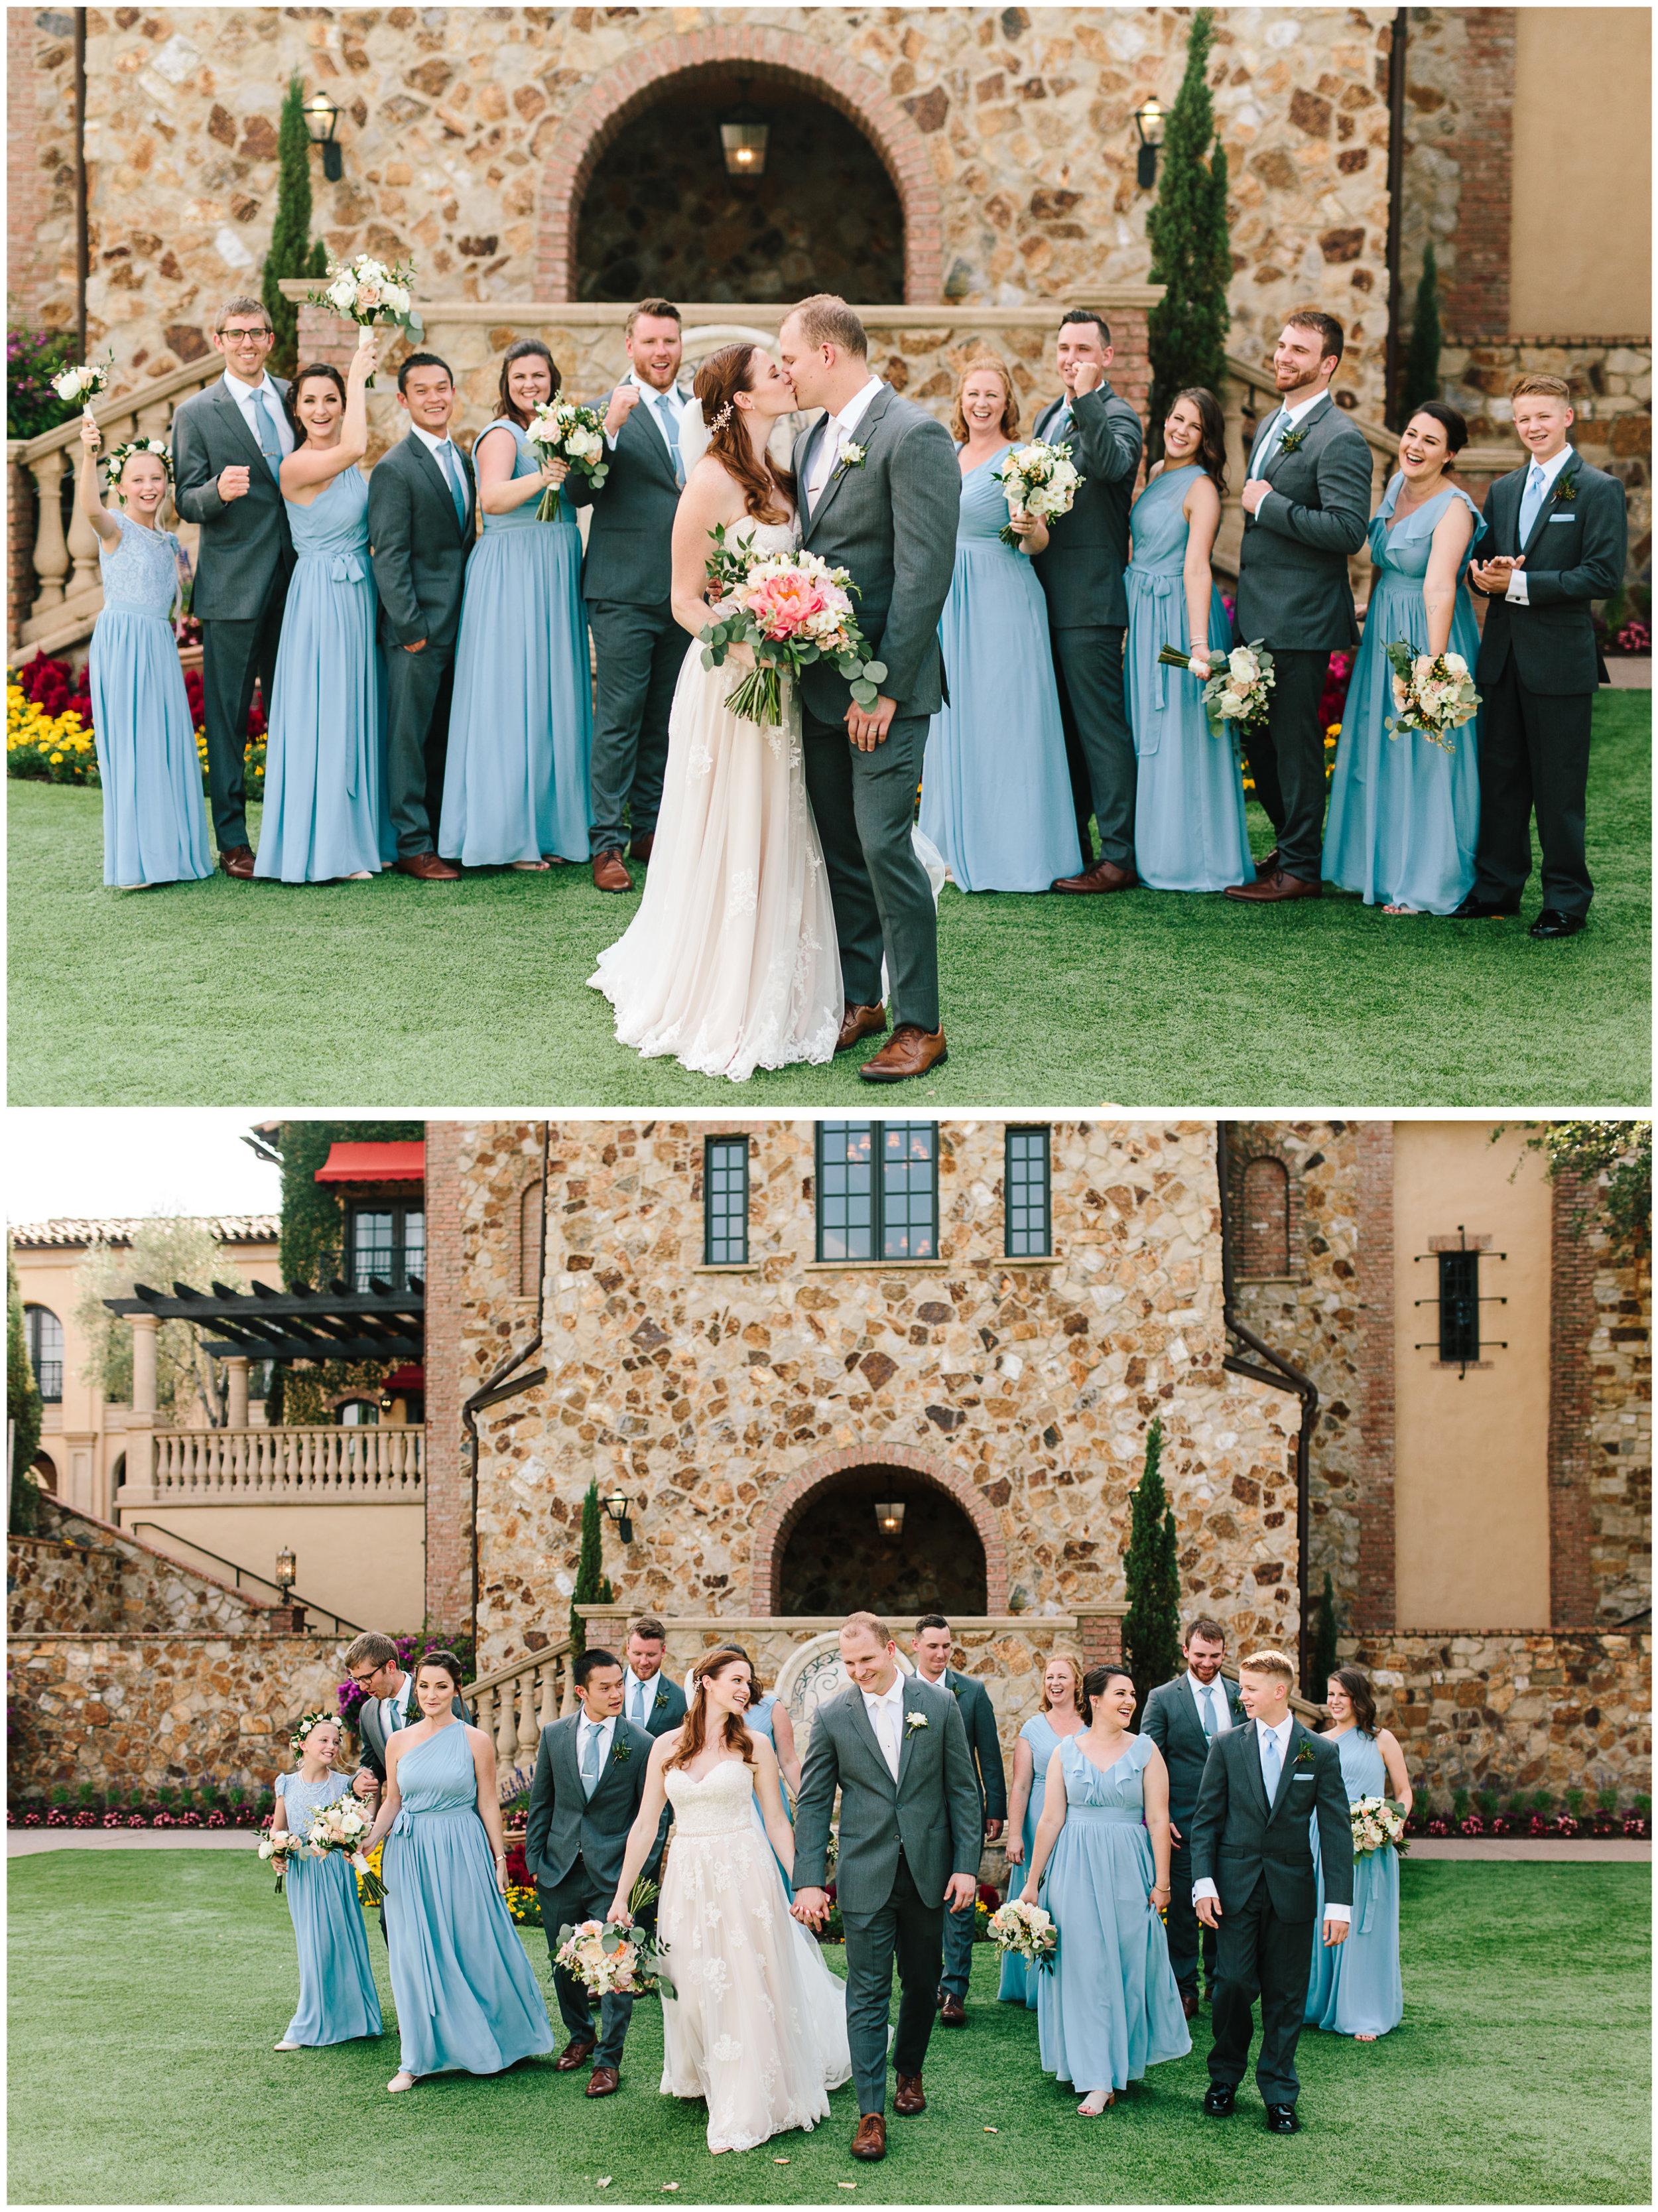 bella_collina_wedding_57.jpg